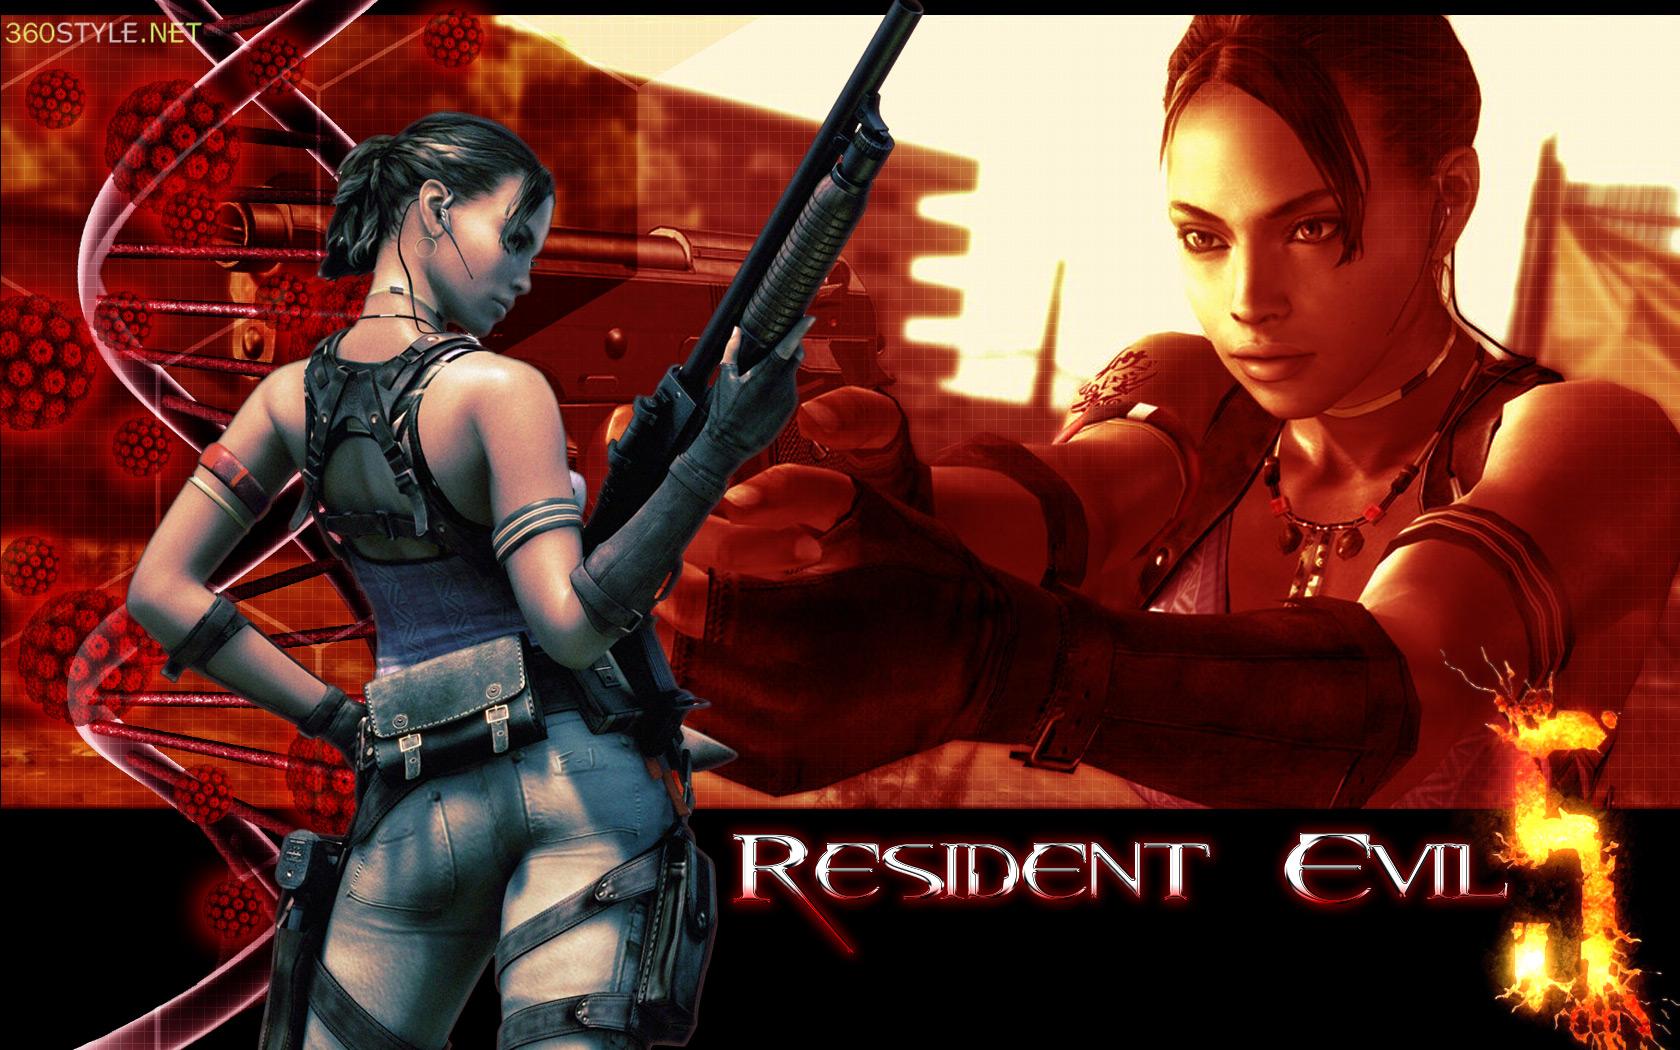 Resident Evil 5 Wallpaper No 2 By F 1 On Deviantart